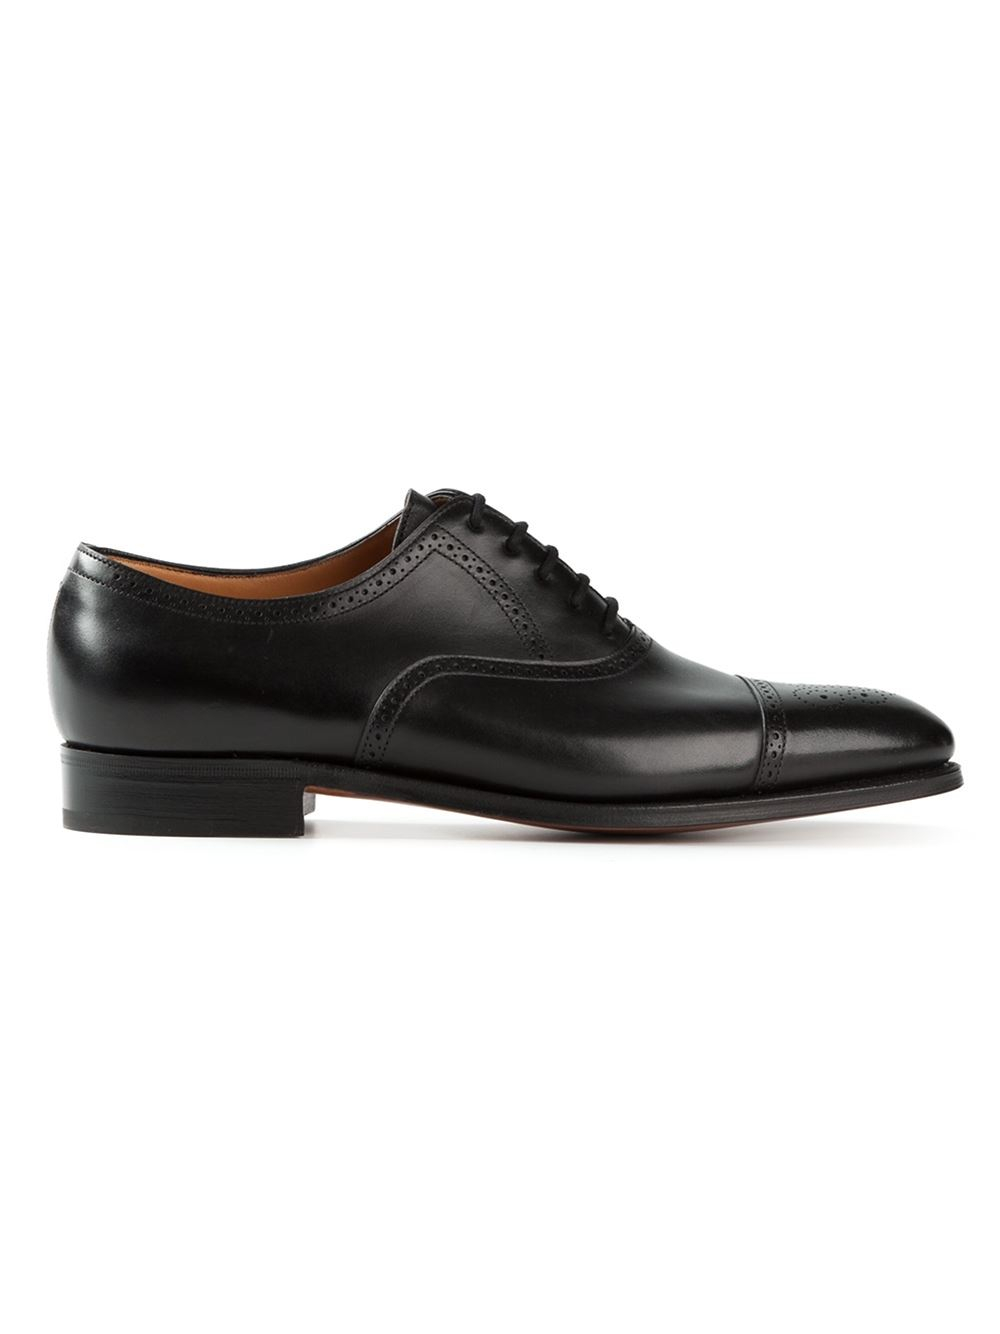 Lyst John Lobb Saunton Oxford Shoes In Black For Men